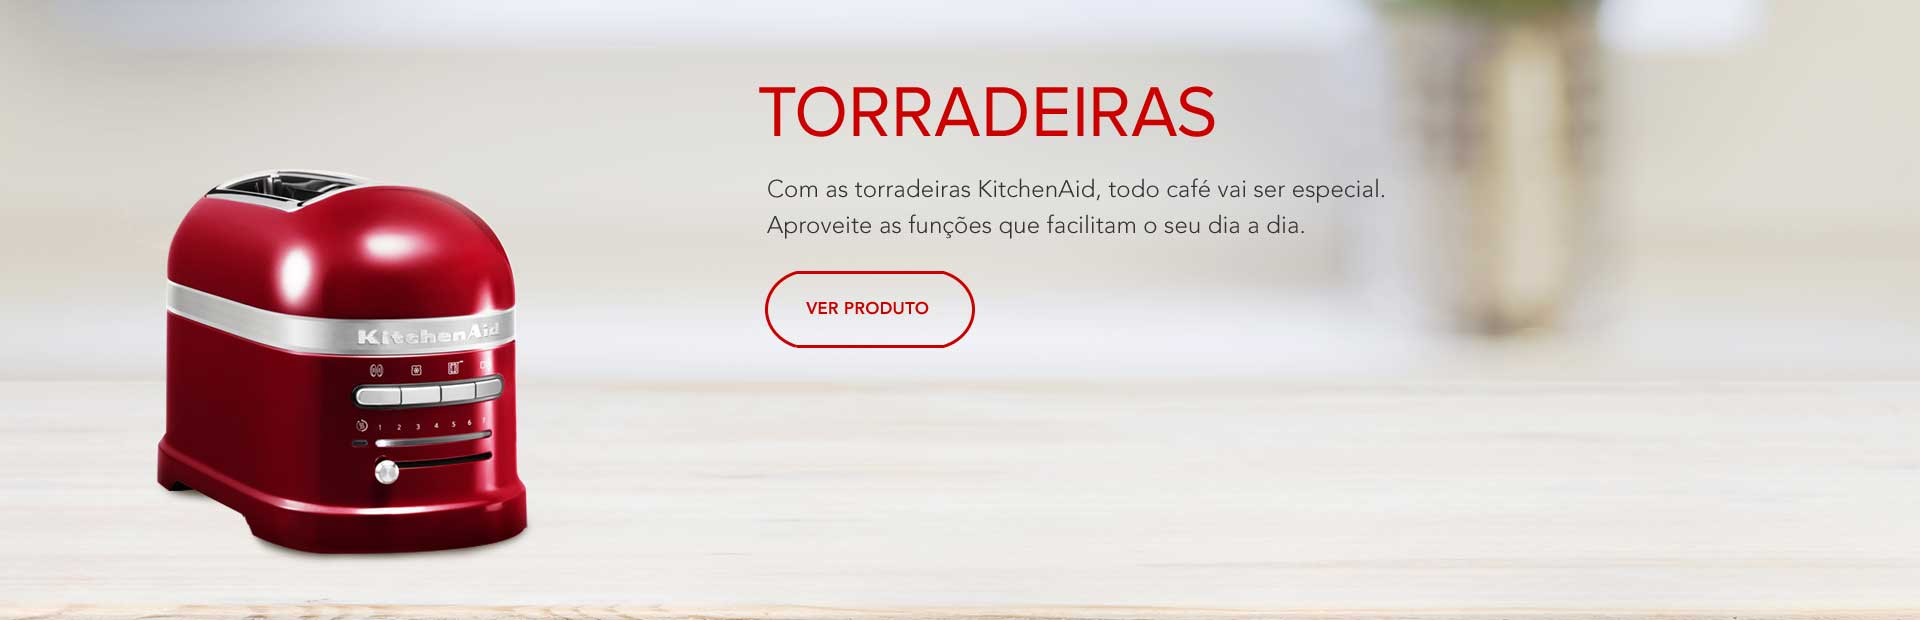 Banner Batedeiras